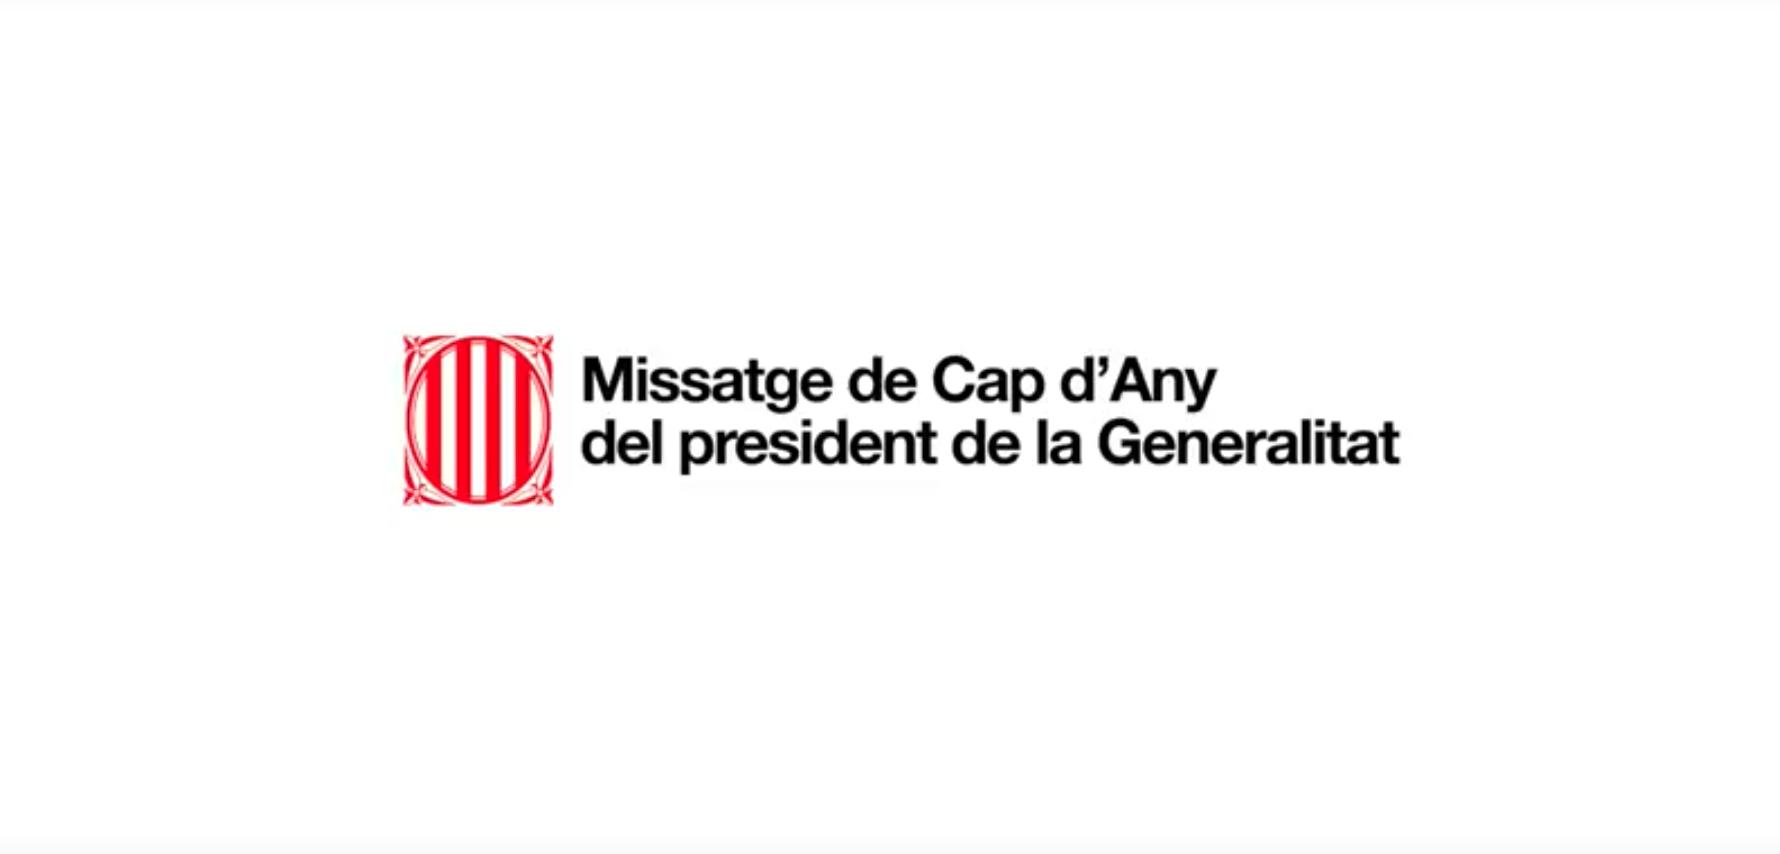 Puigdemont se ha presentado como «presidente de la Generalitat» pese a que está destituido.